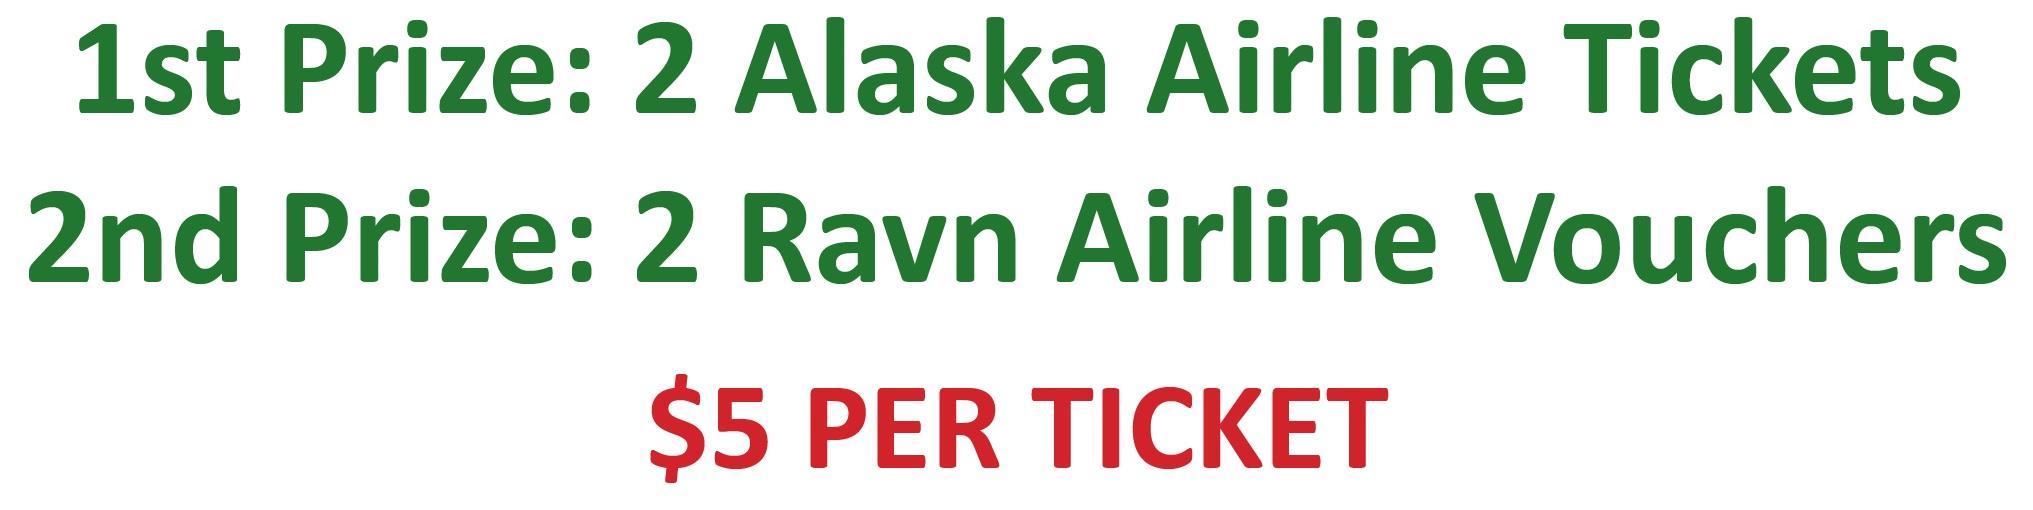 ticket cost.jpg